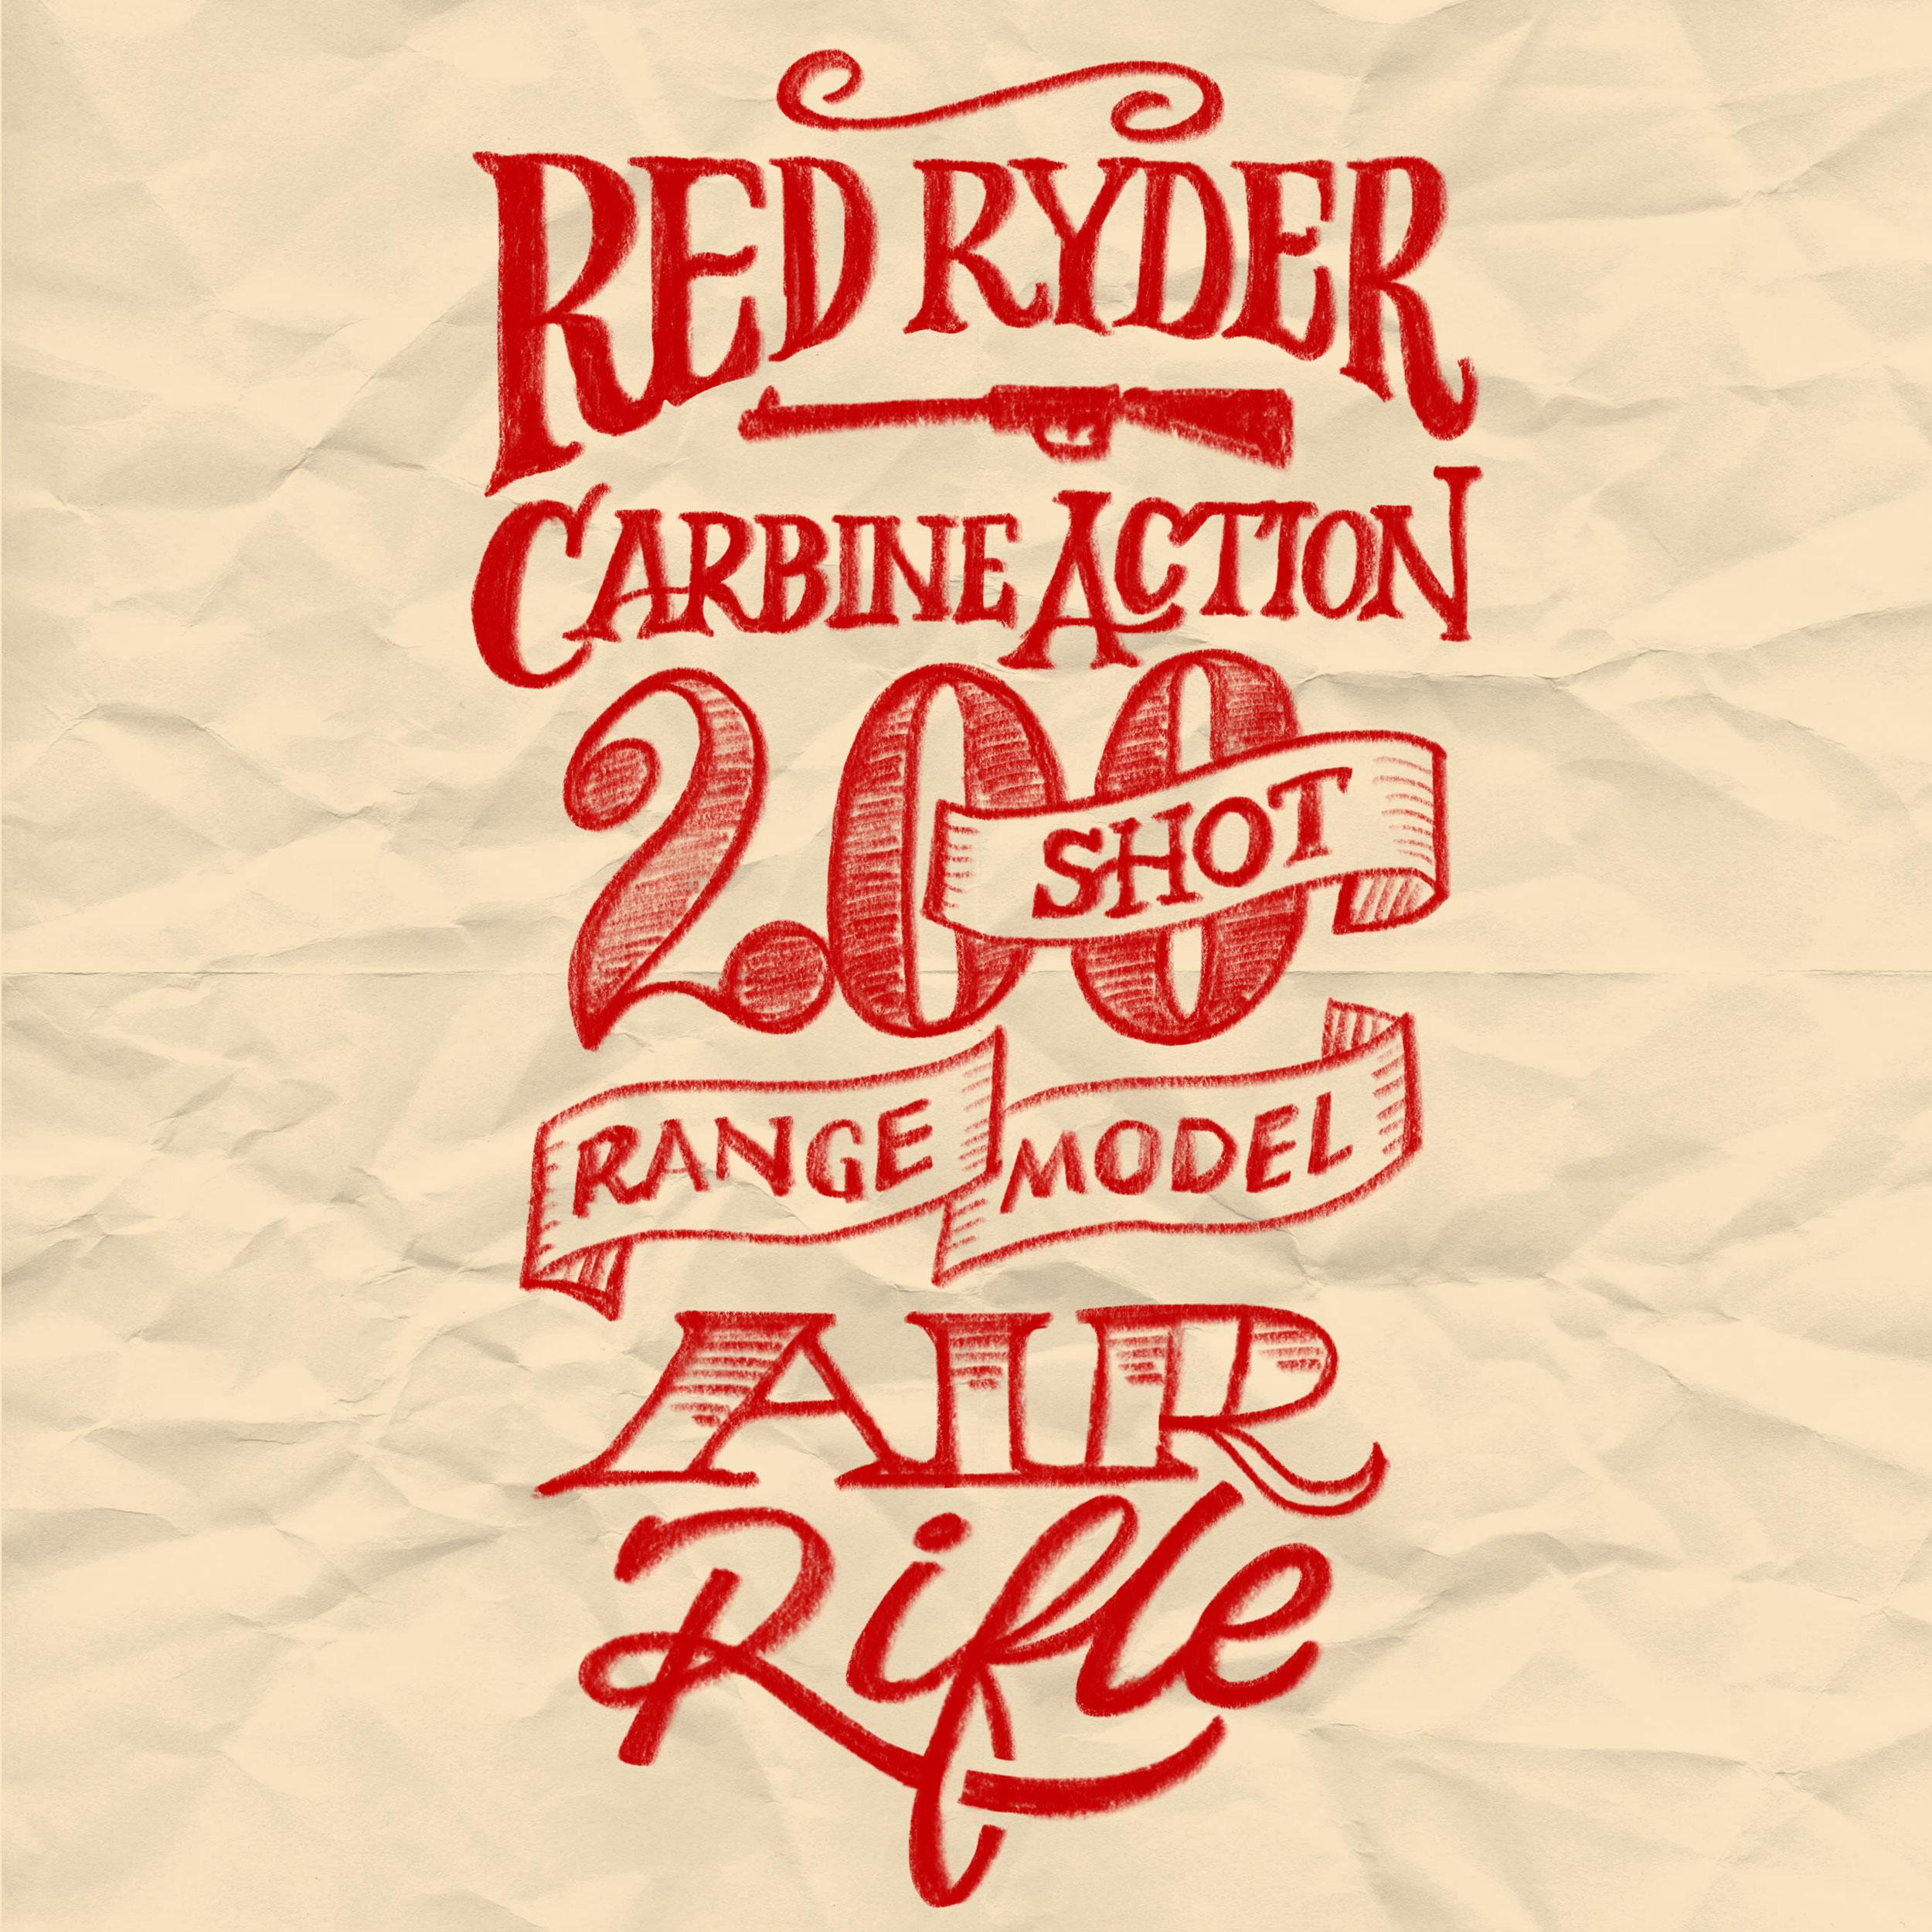 red ryder xmas story rifle.jpg